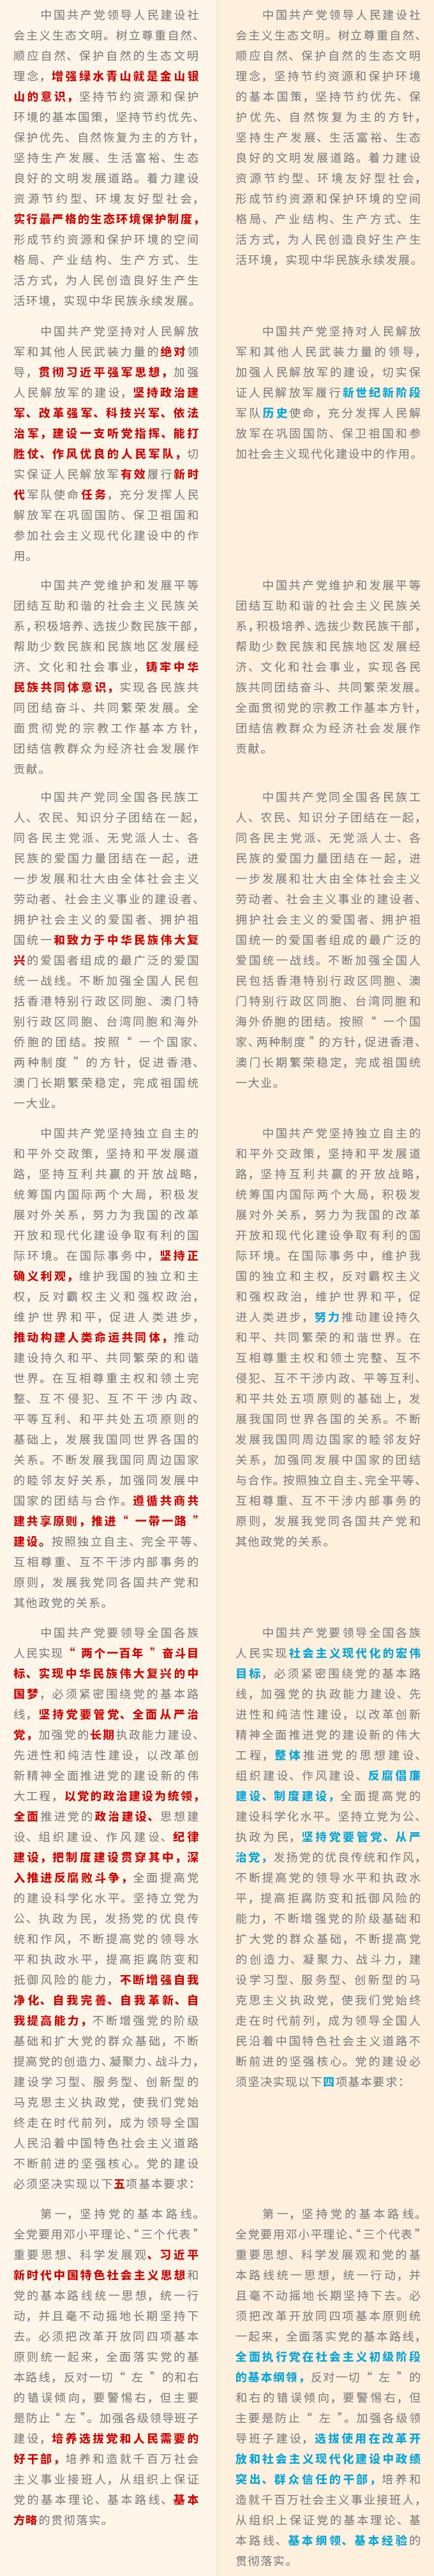 http://www.ccdi.gov.cn/yw/201710/W020171031664657819903.png